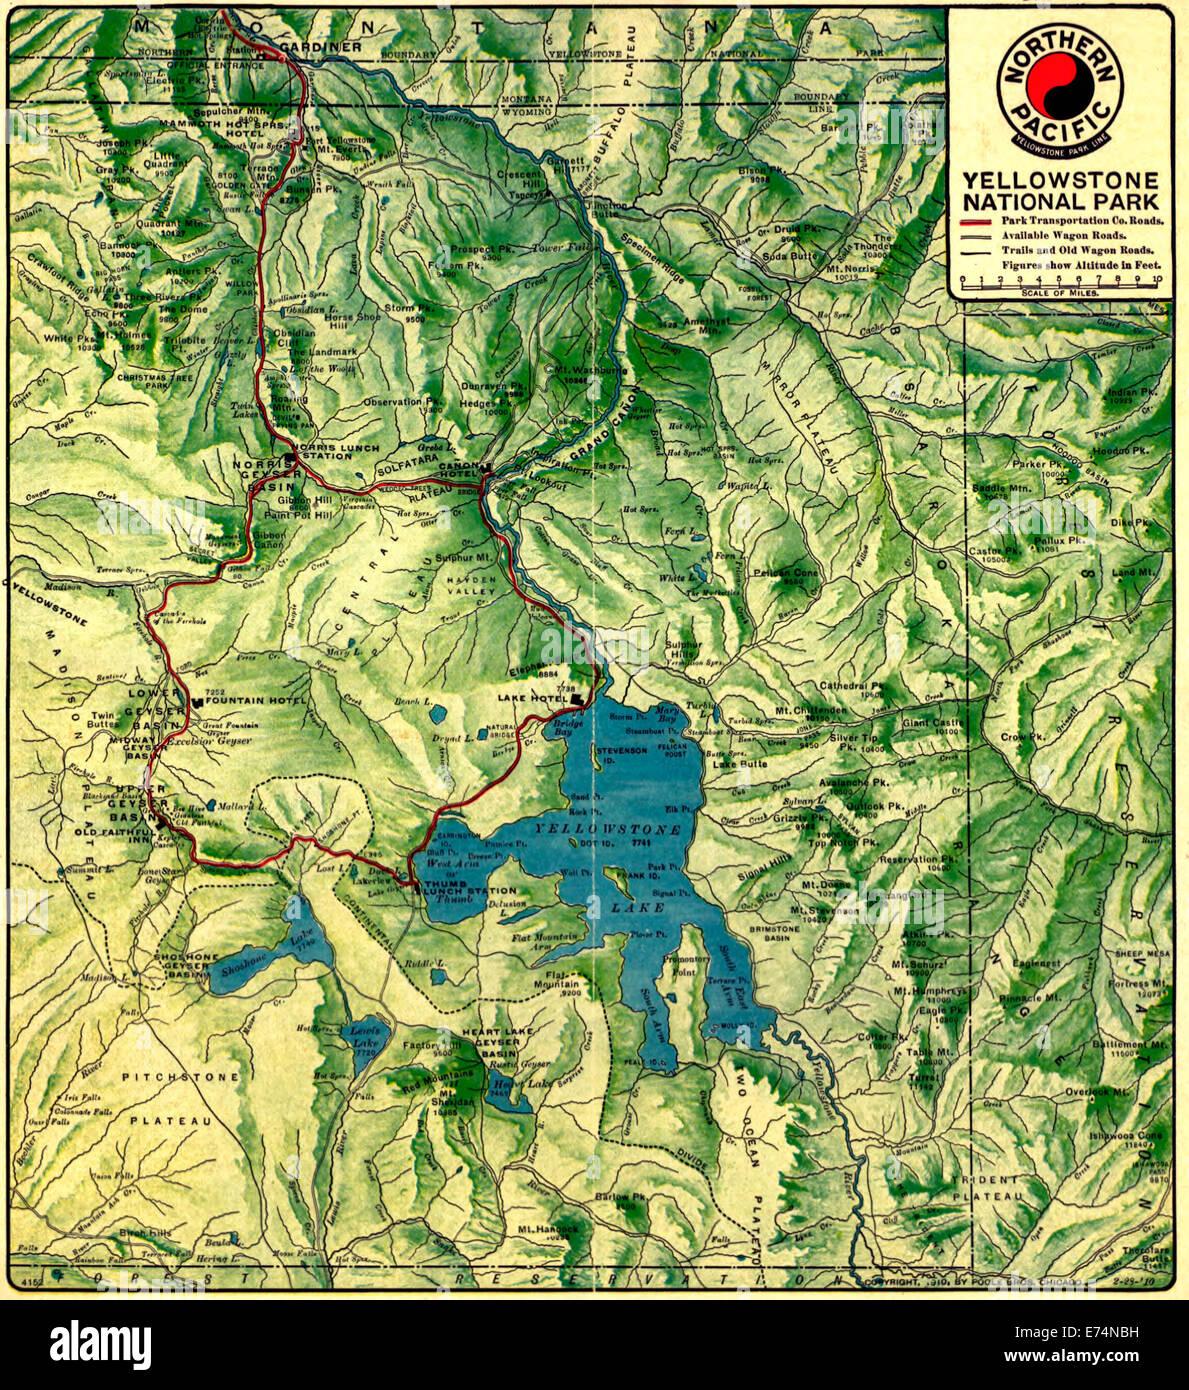 Yellowstone Karte.Karte Von Yellowstone Nationalpark Wyoming 1910 Stockfoto Bild